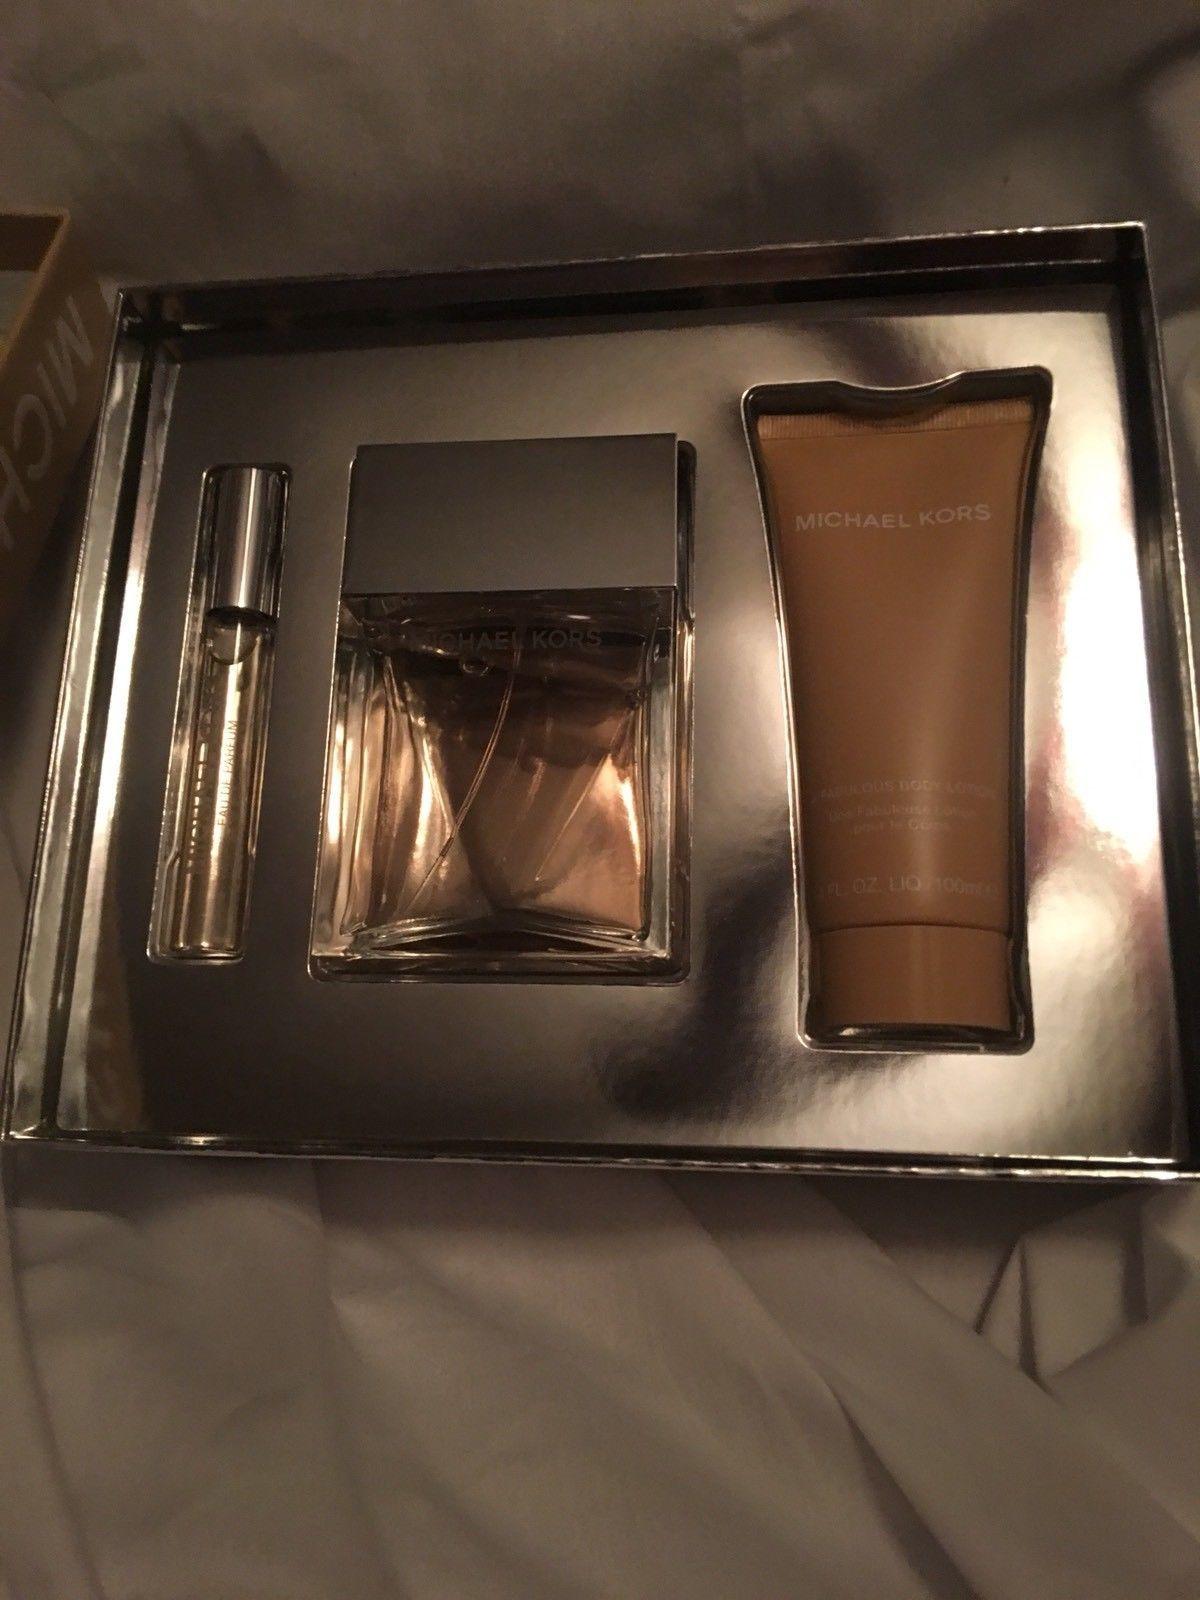 Michael Kors 3 Piece Gift Set Eau de Parfum Spray & Rollerball Fabulous Lotion